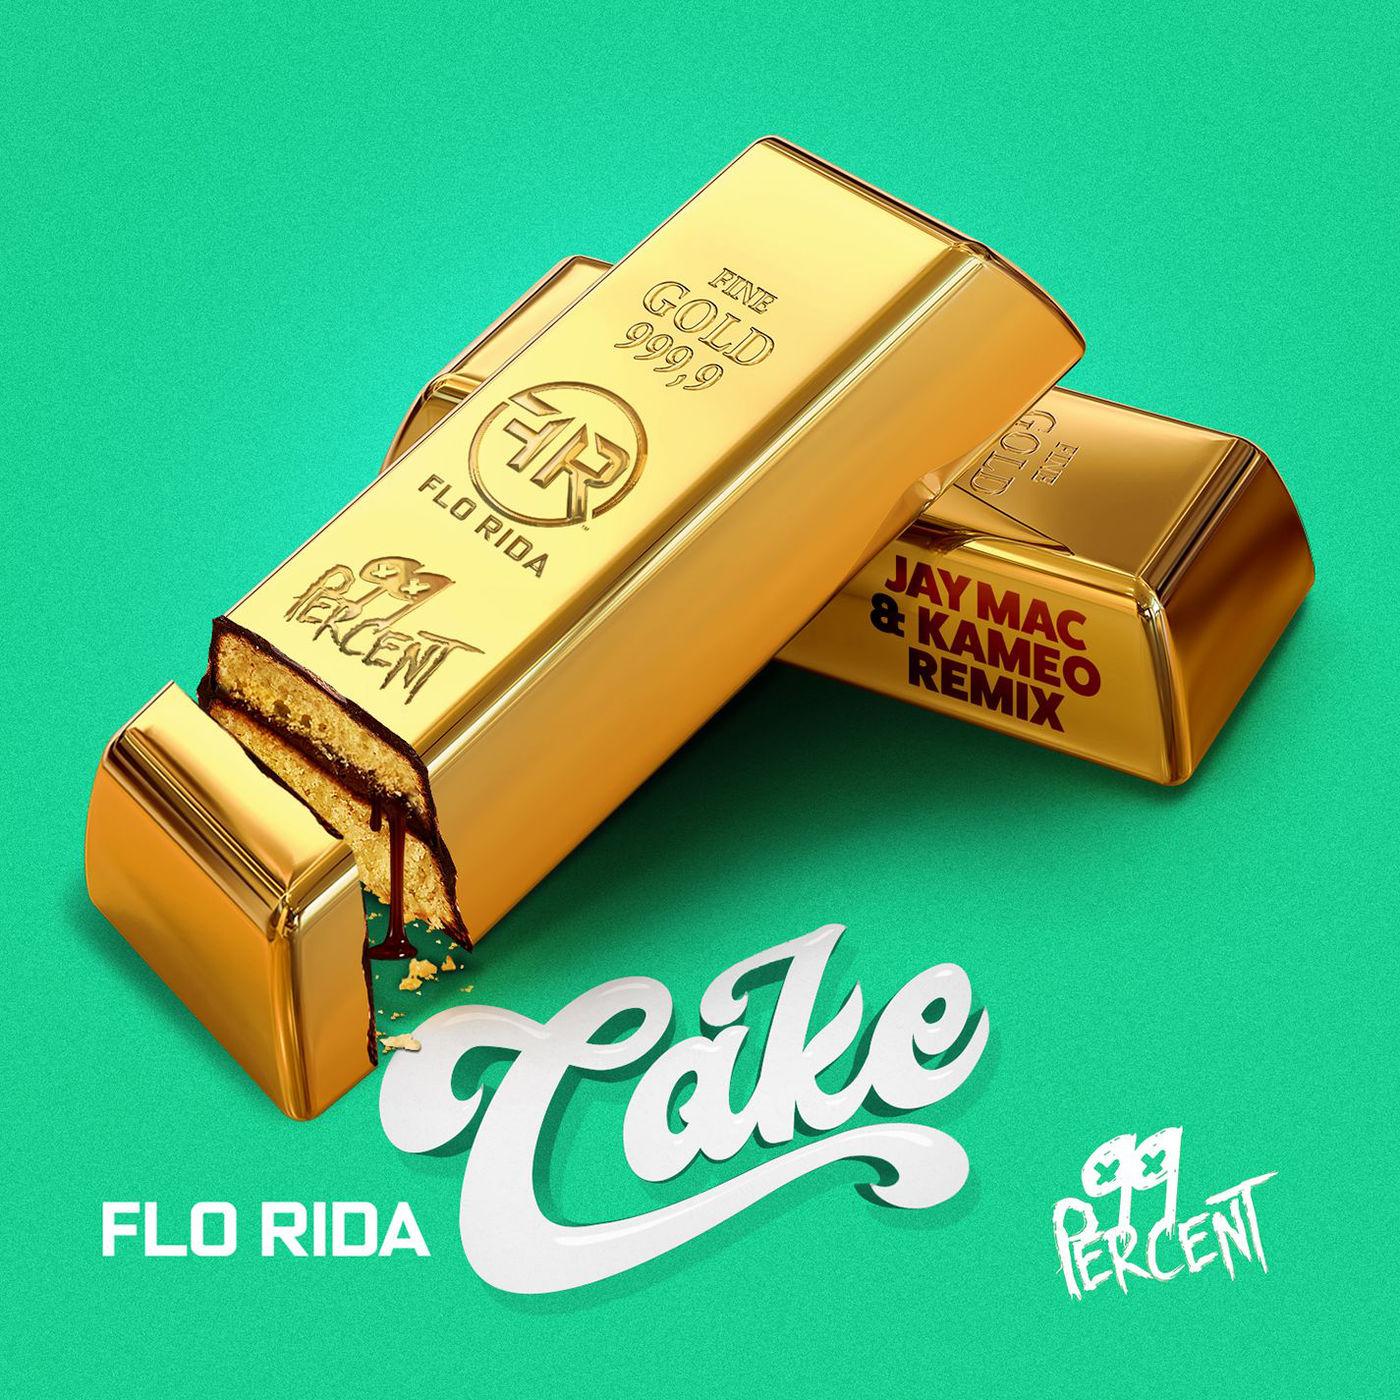 Flo Rida & 99 Percent - Cake (Jay Mac & Kameo Remix) - Single Cover